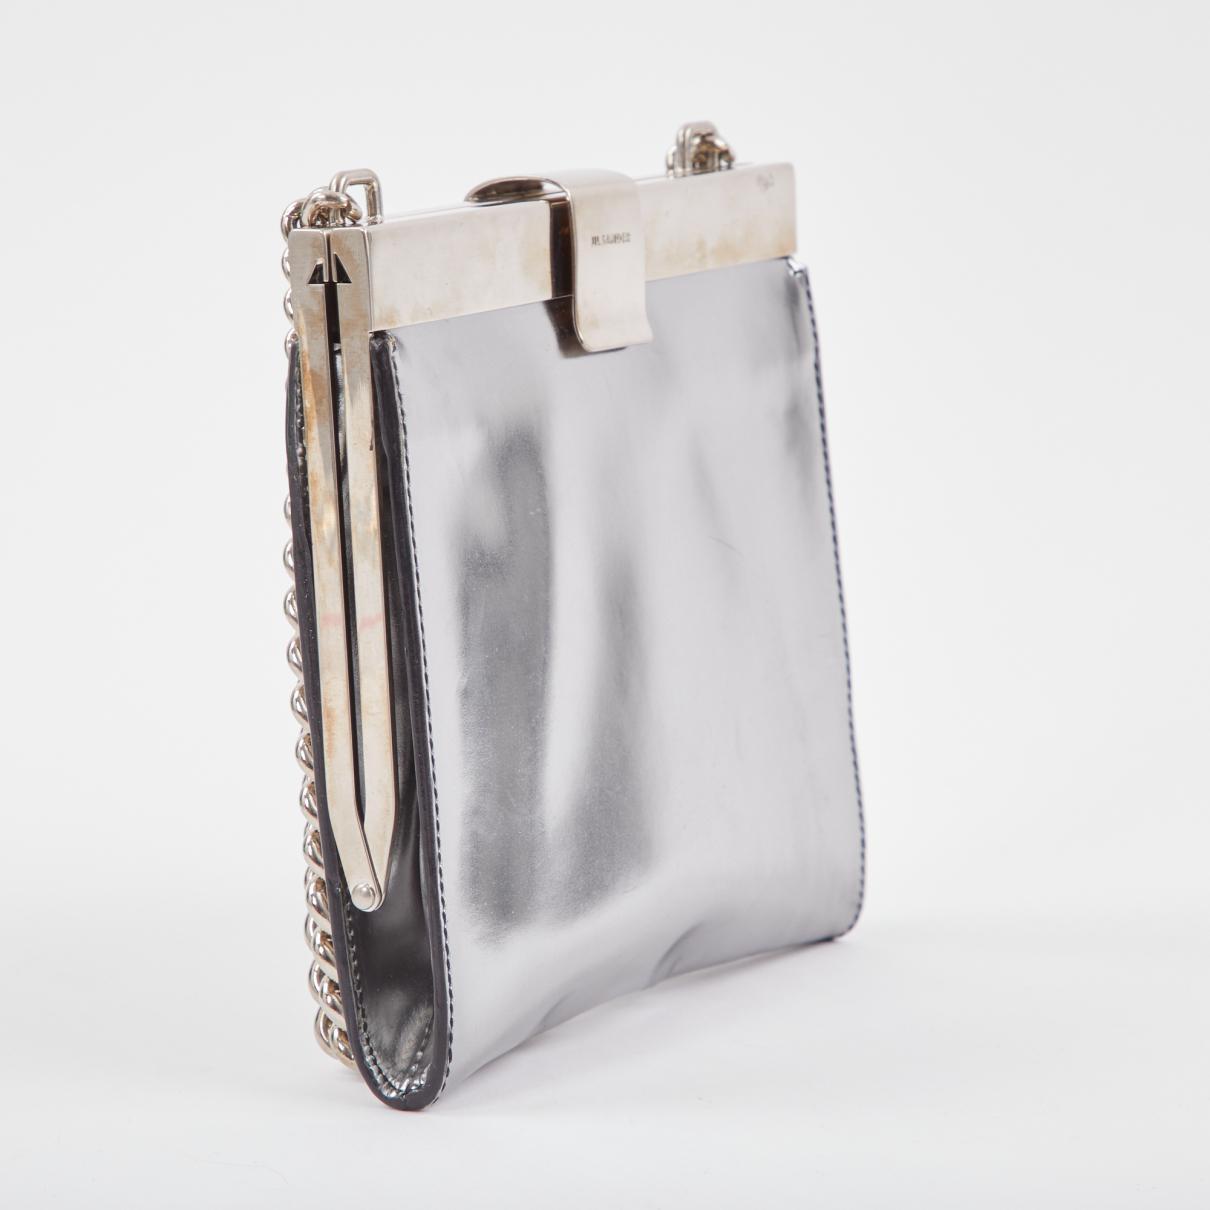 Pre-owned - Clutch bag Jil Sander 9oBca